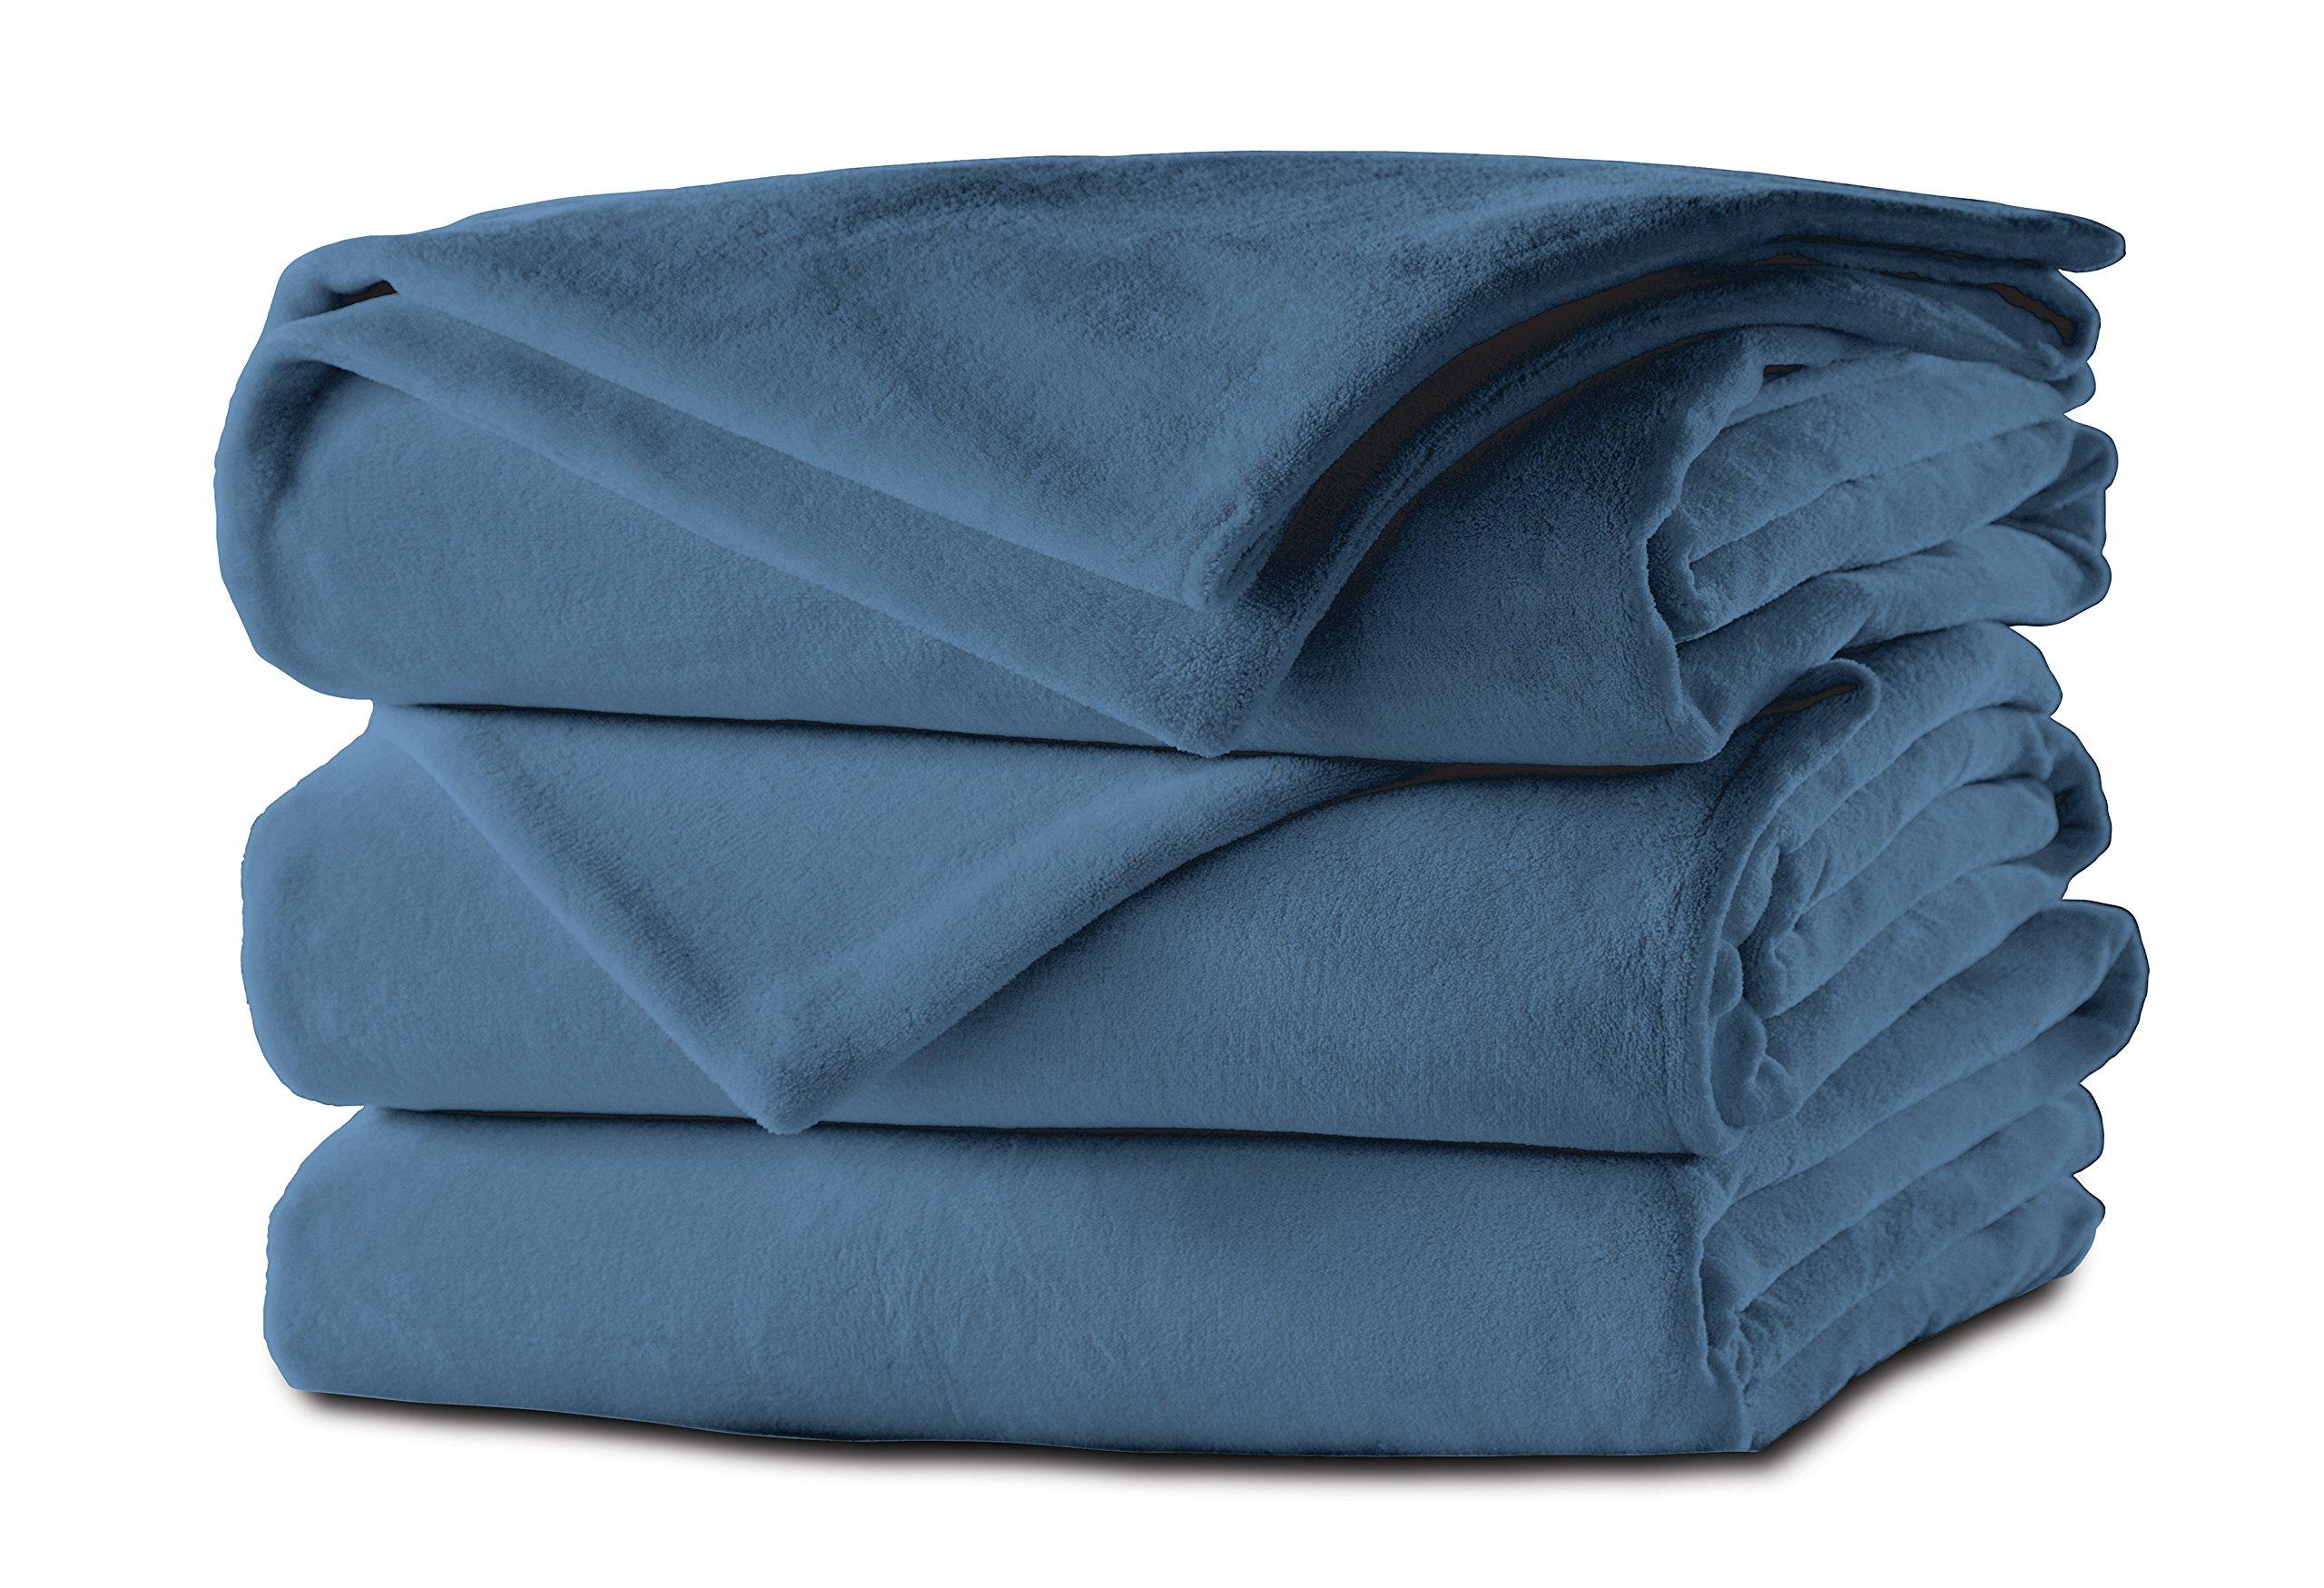 Sunbeam Microplush Heated Blanket, King, Lagoon, BSM9KKS-R531-16A00